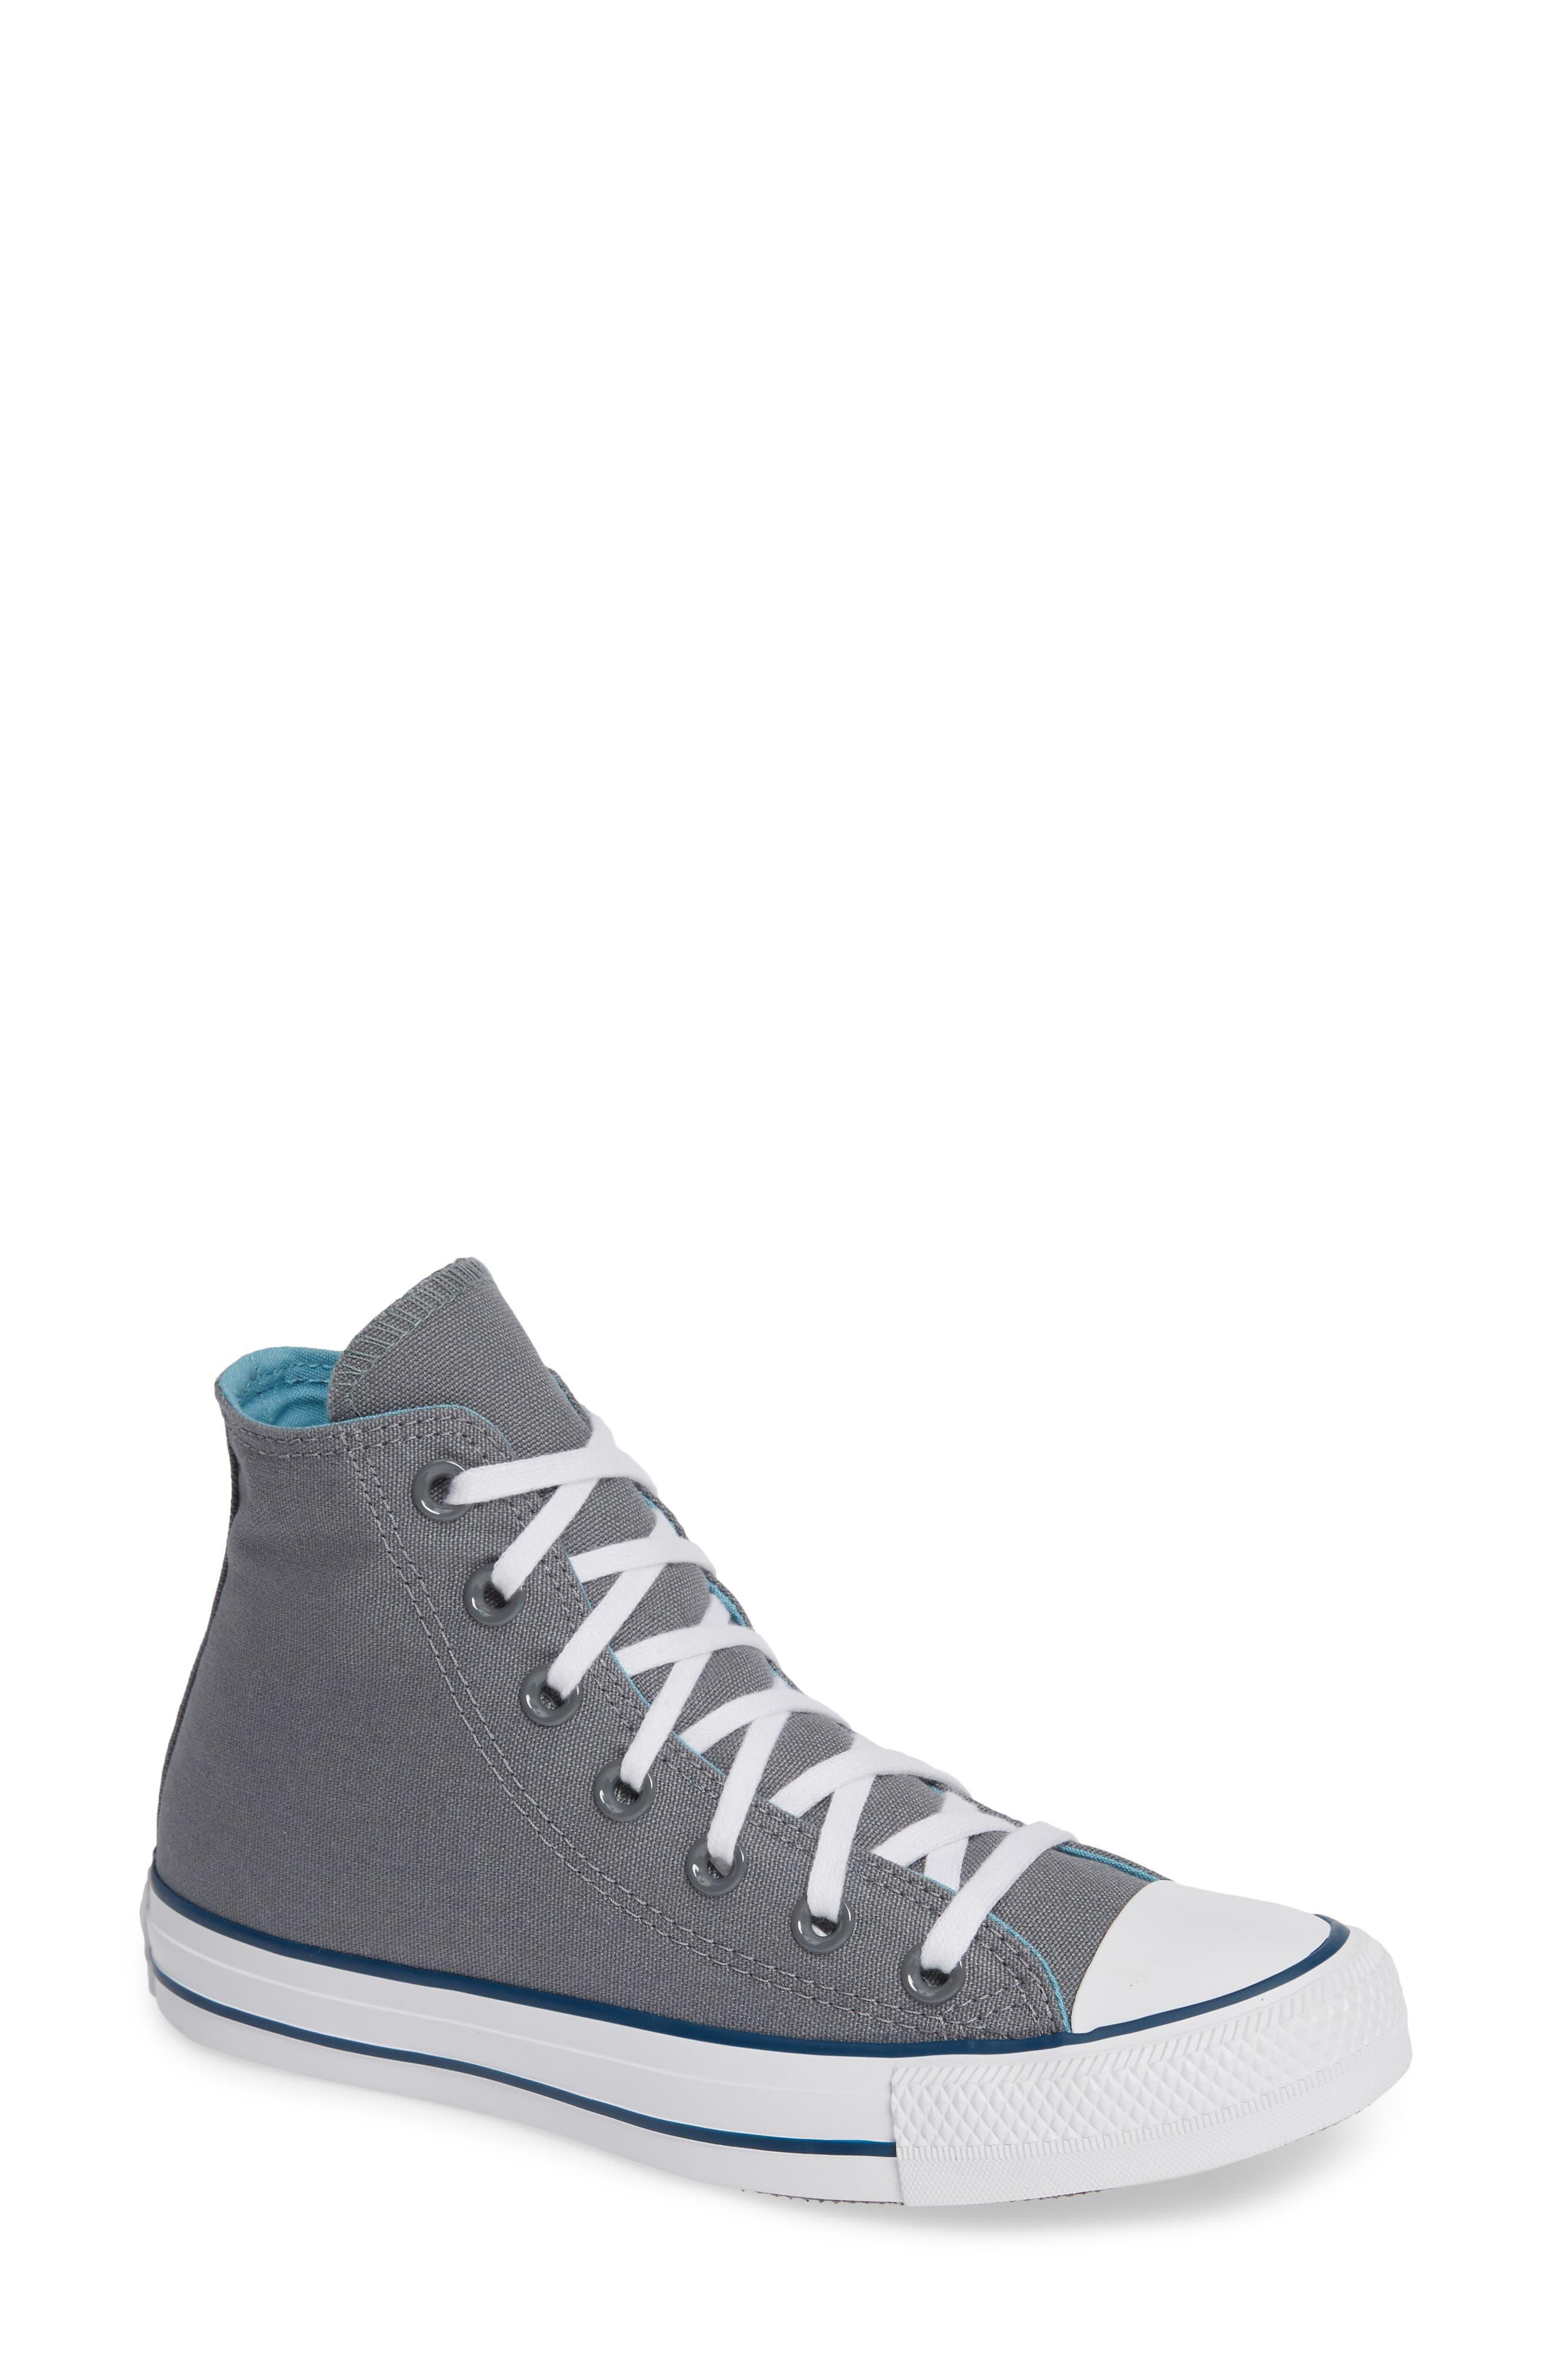 Chuck Taylor<sup>®</sup> All Star<sup>®</sup> Seasonal Hi Sneaker,                         Main,                         color, 039